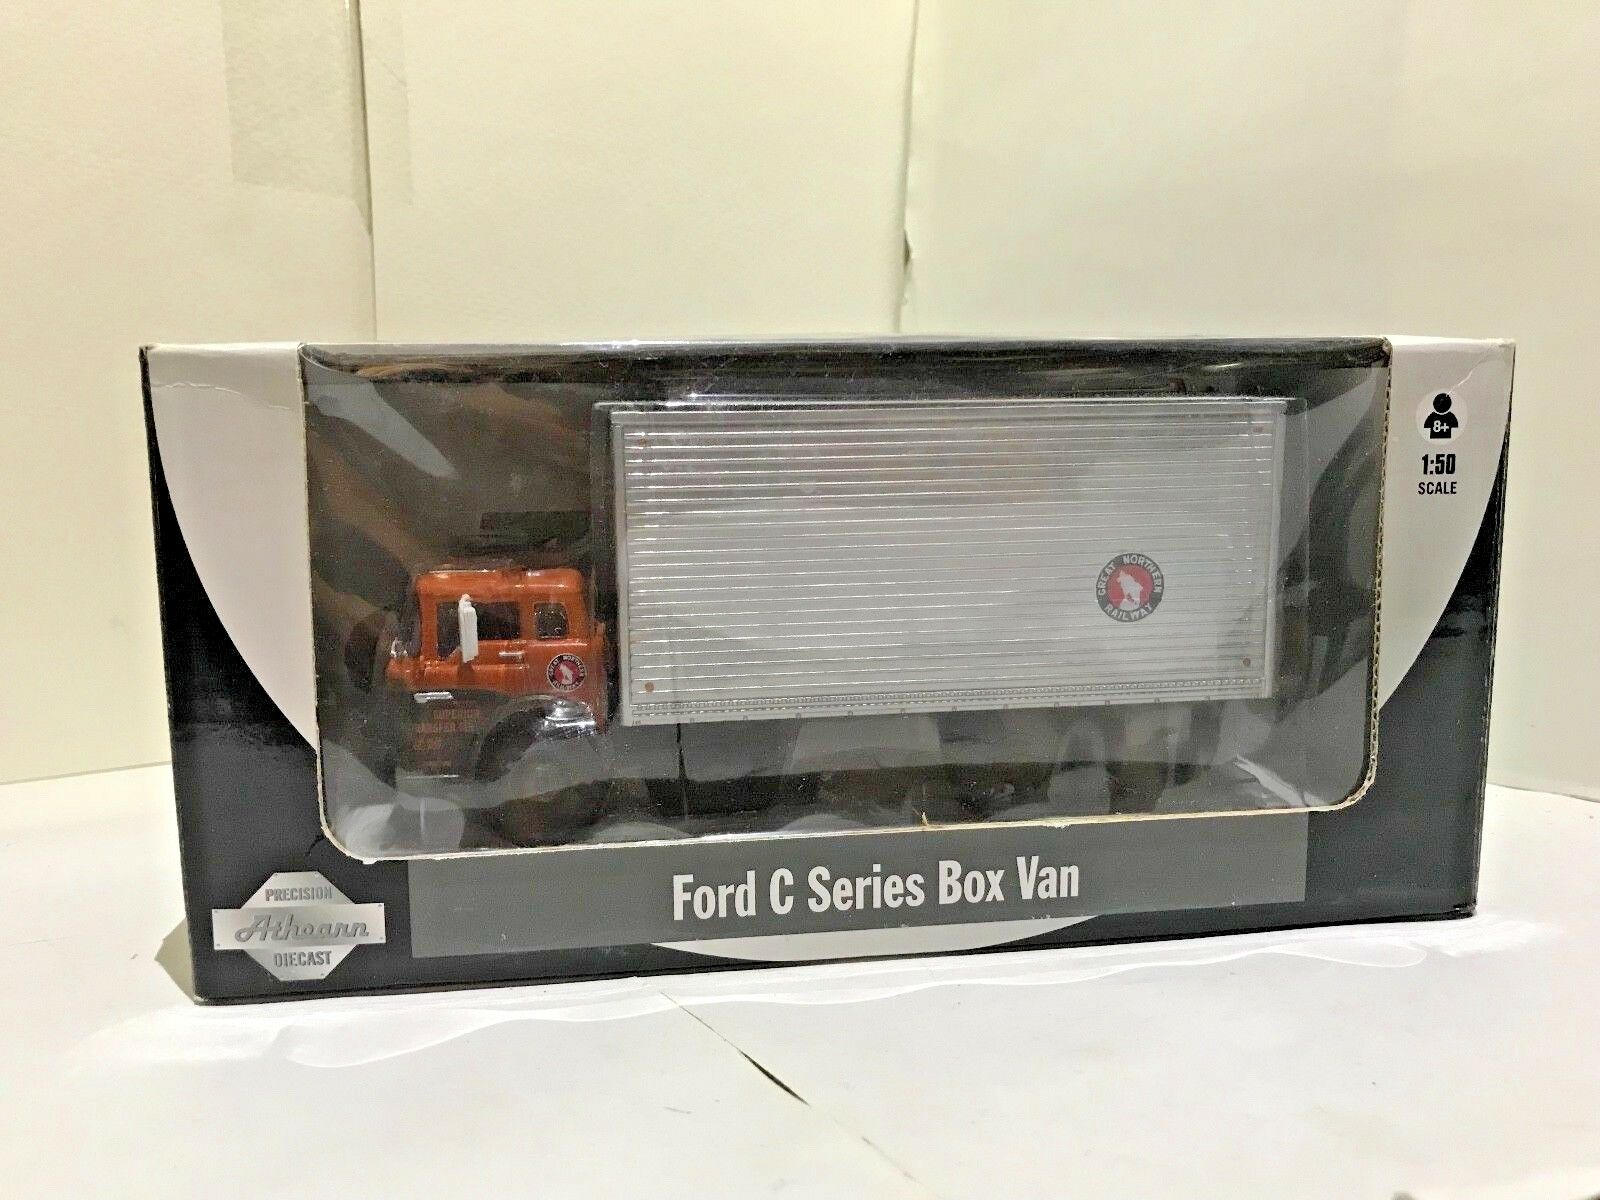 Athearn Ford Van Camión Caja de serie C, trenes de juguete clásicos o escala 1 50, En Caja